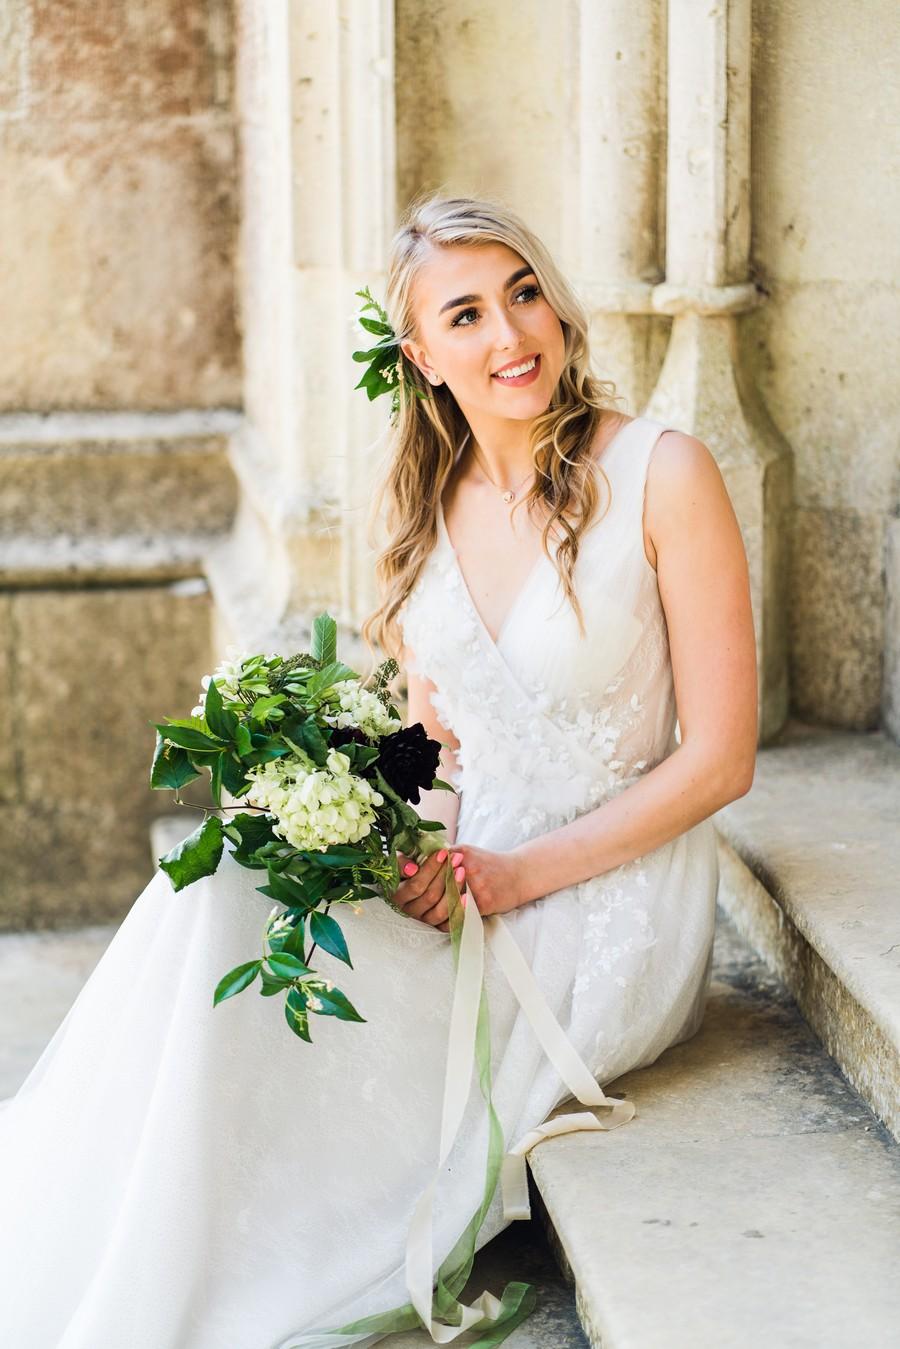 Highcliffe Castle wedding inspiration on the English Wedding Blog (37)